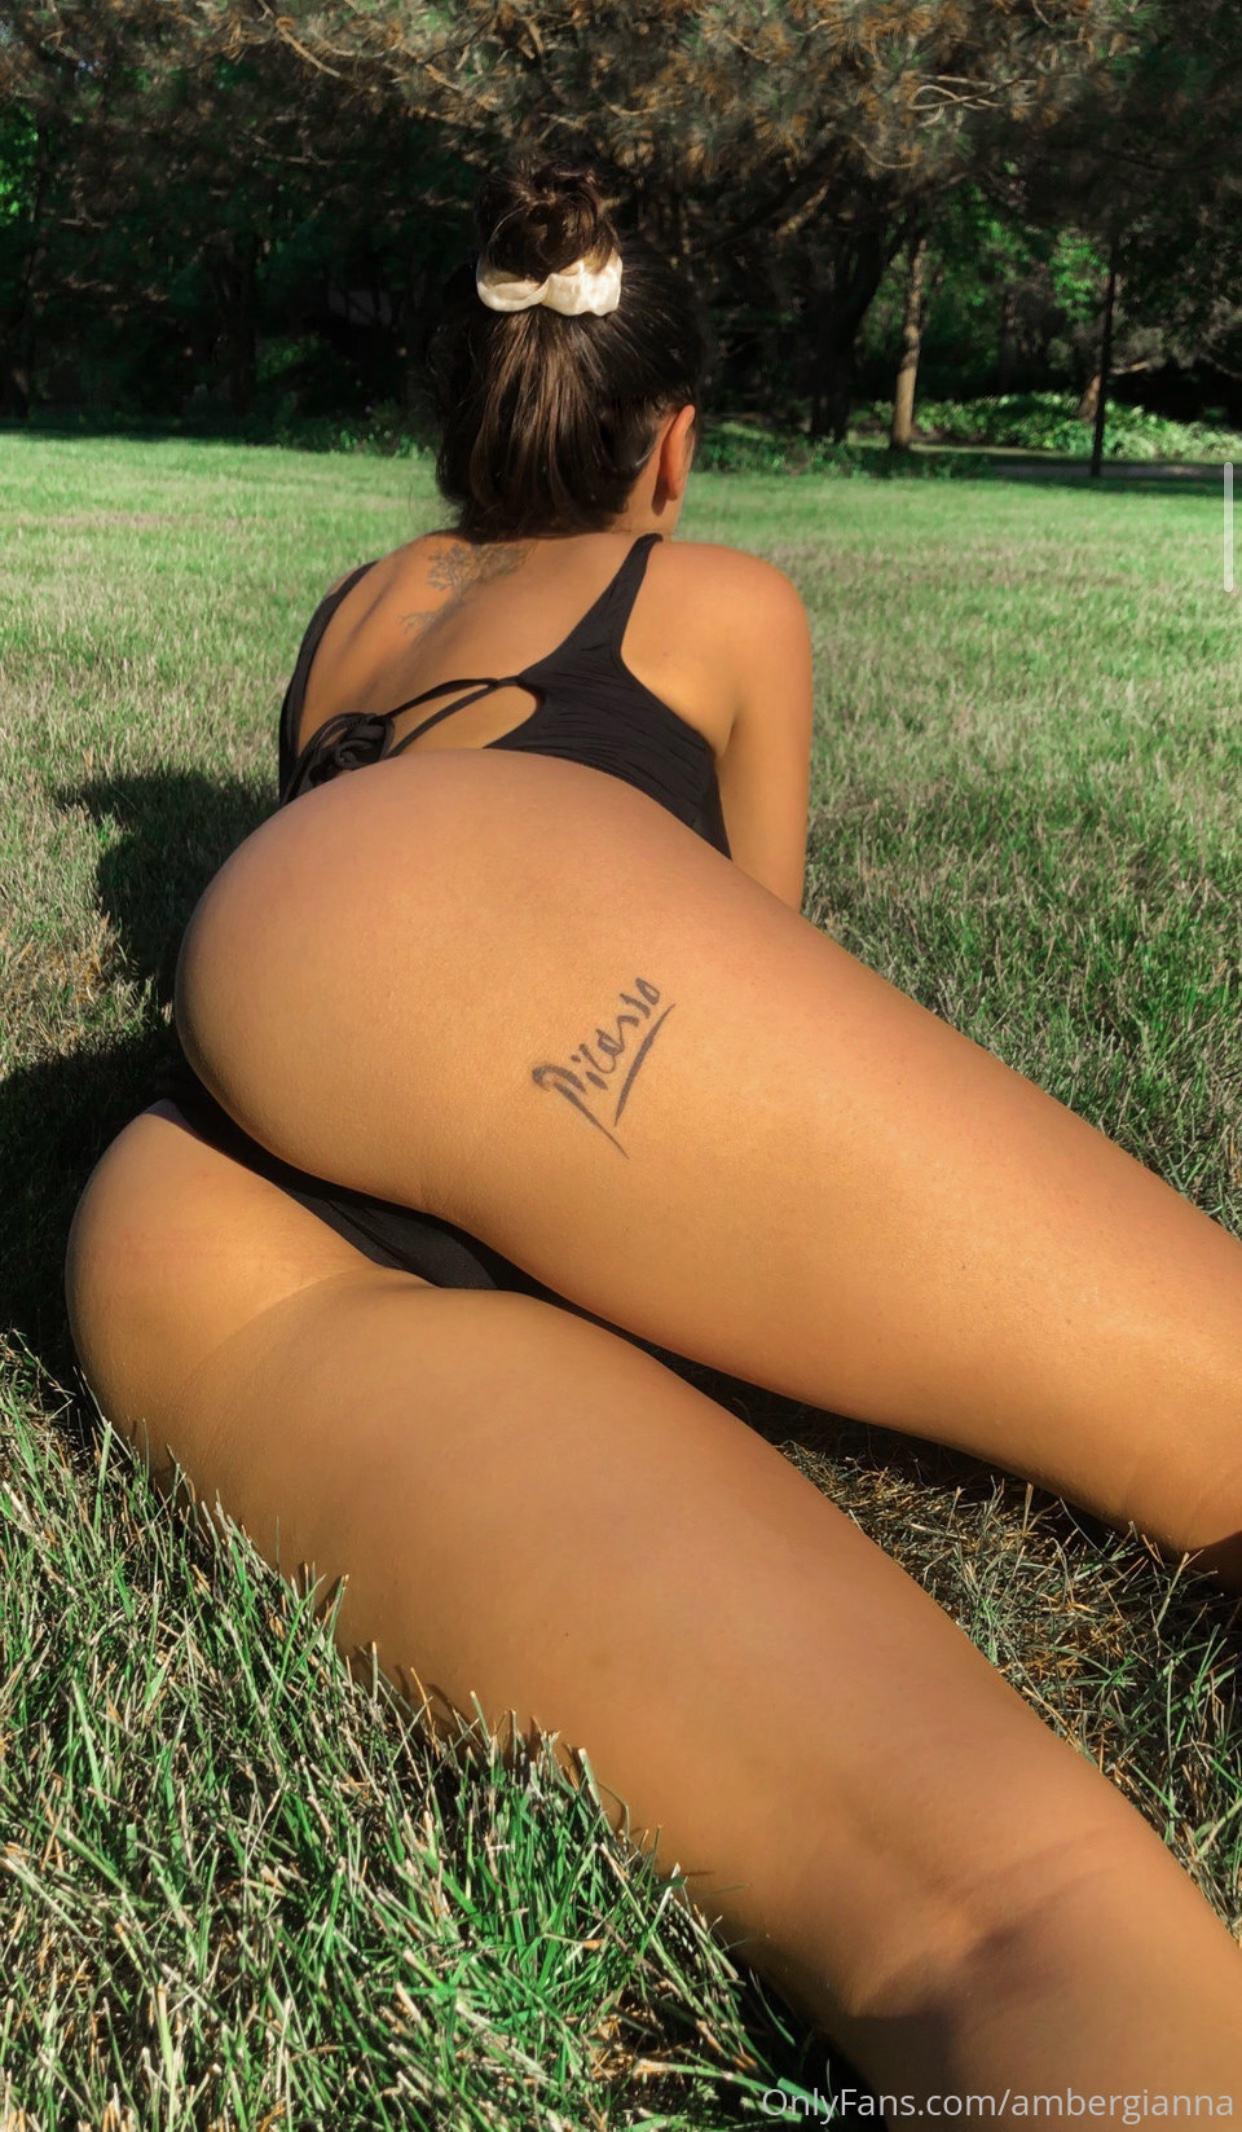 Amber Gianna Onlyfans 0084